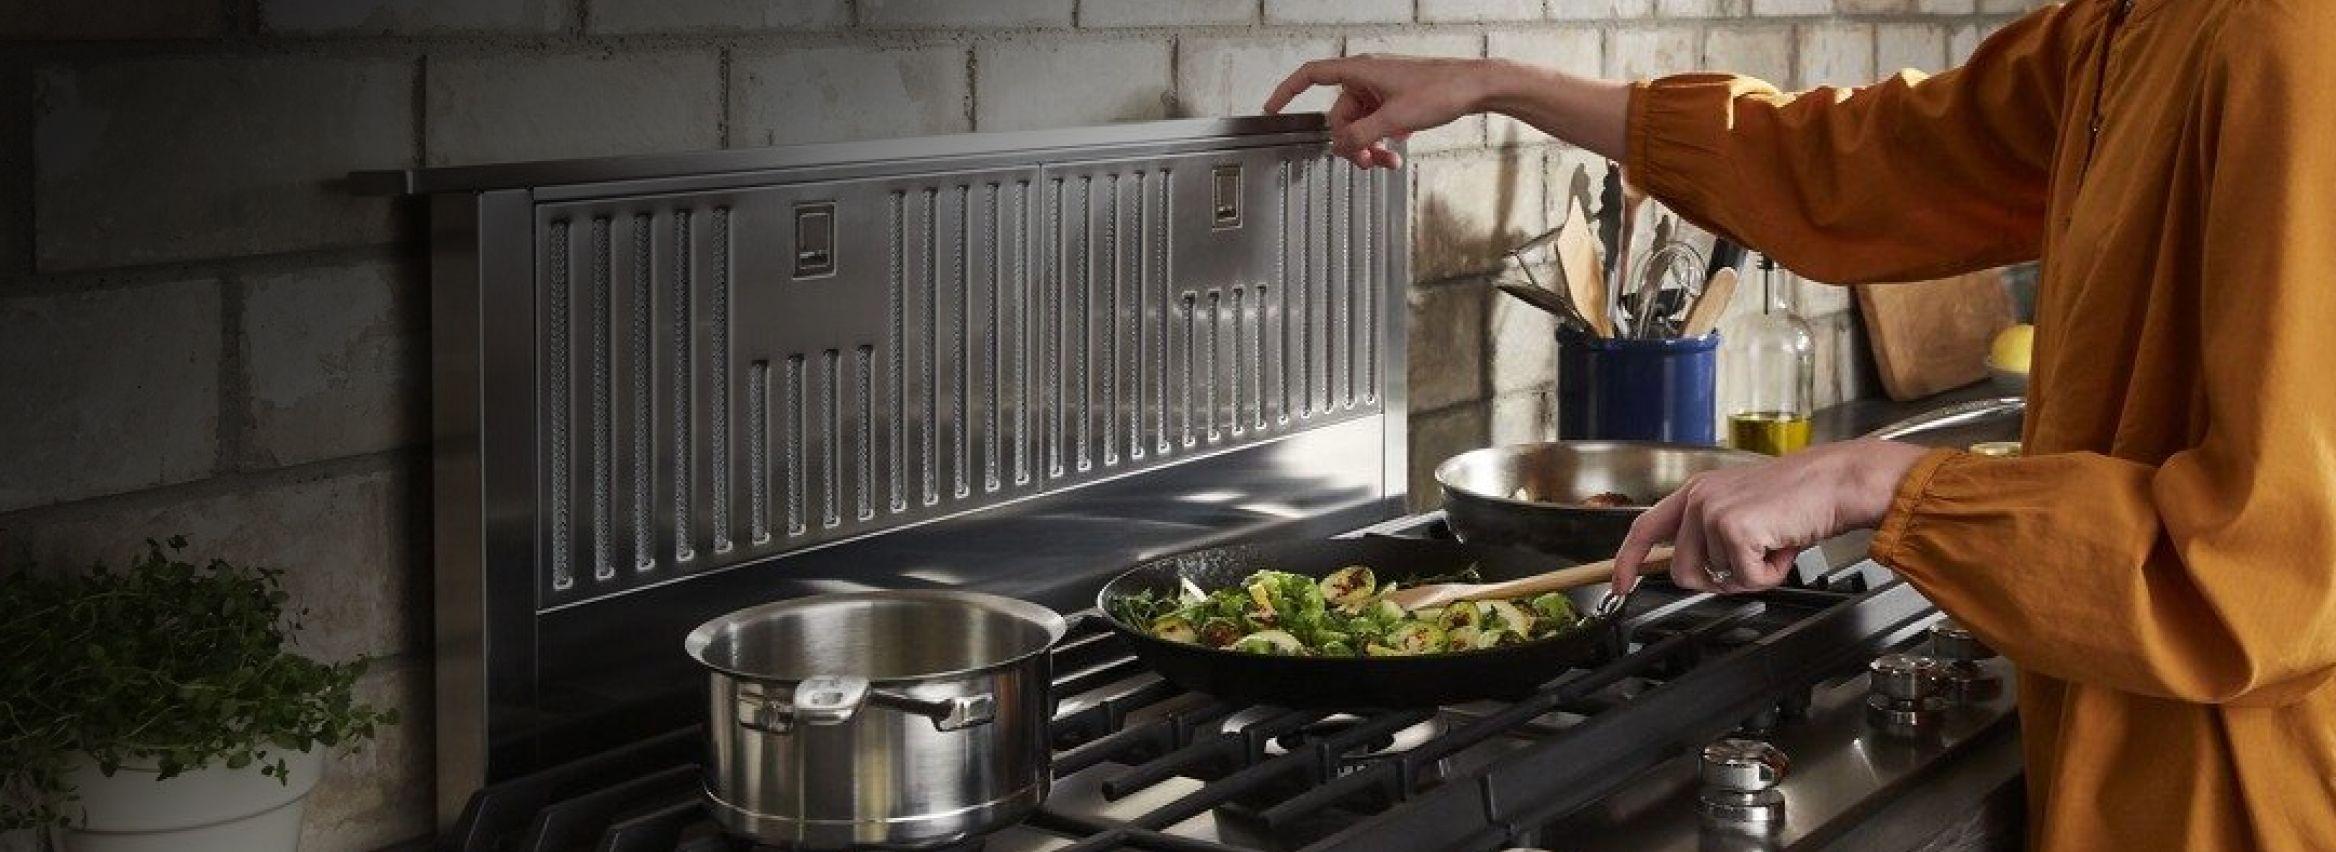 Cooking on a KitchenAid® range.